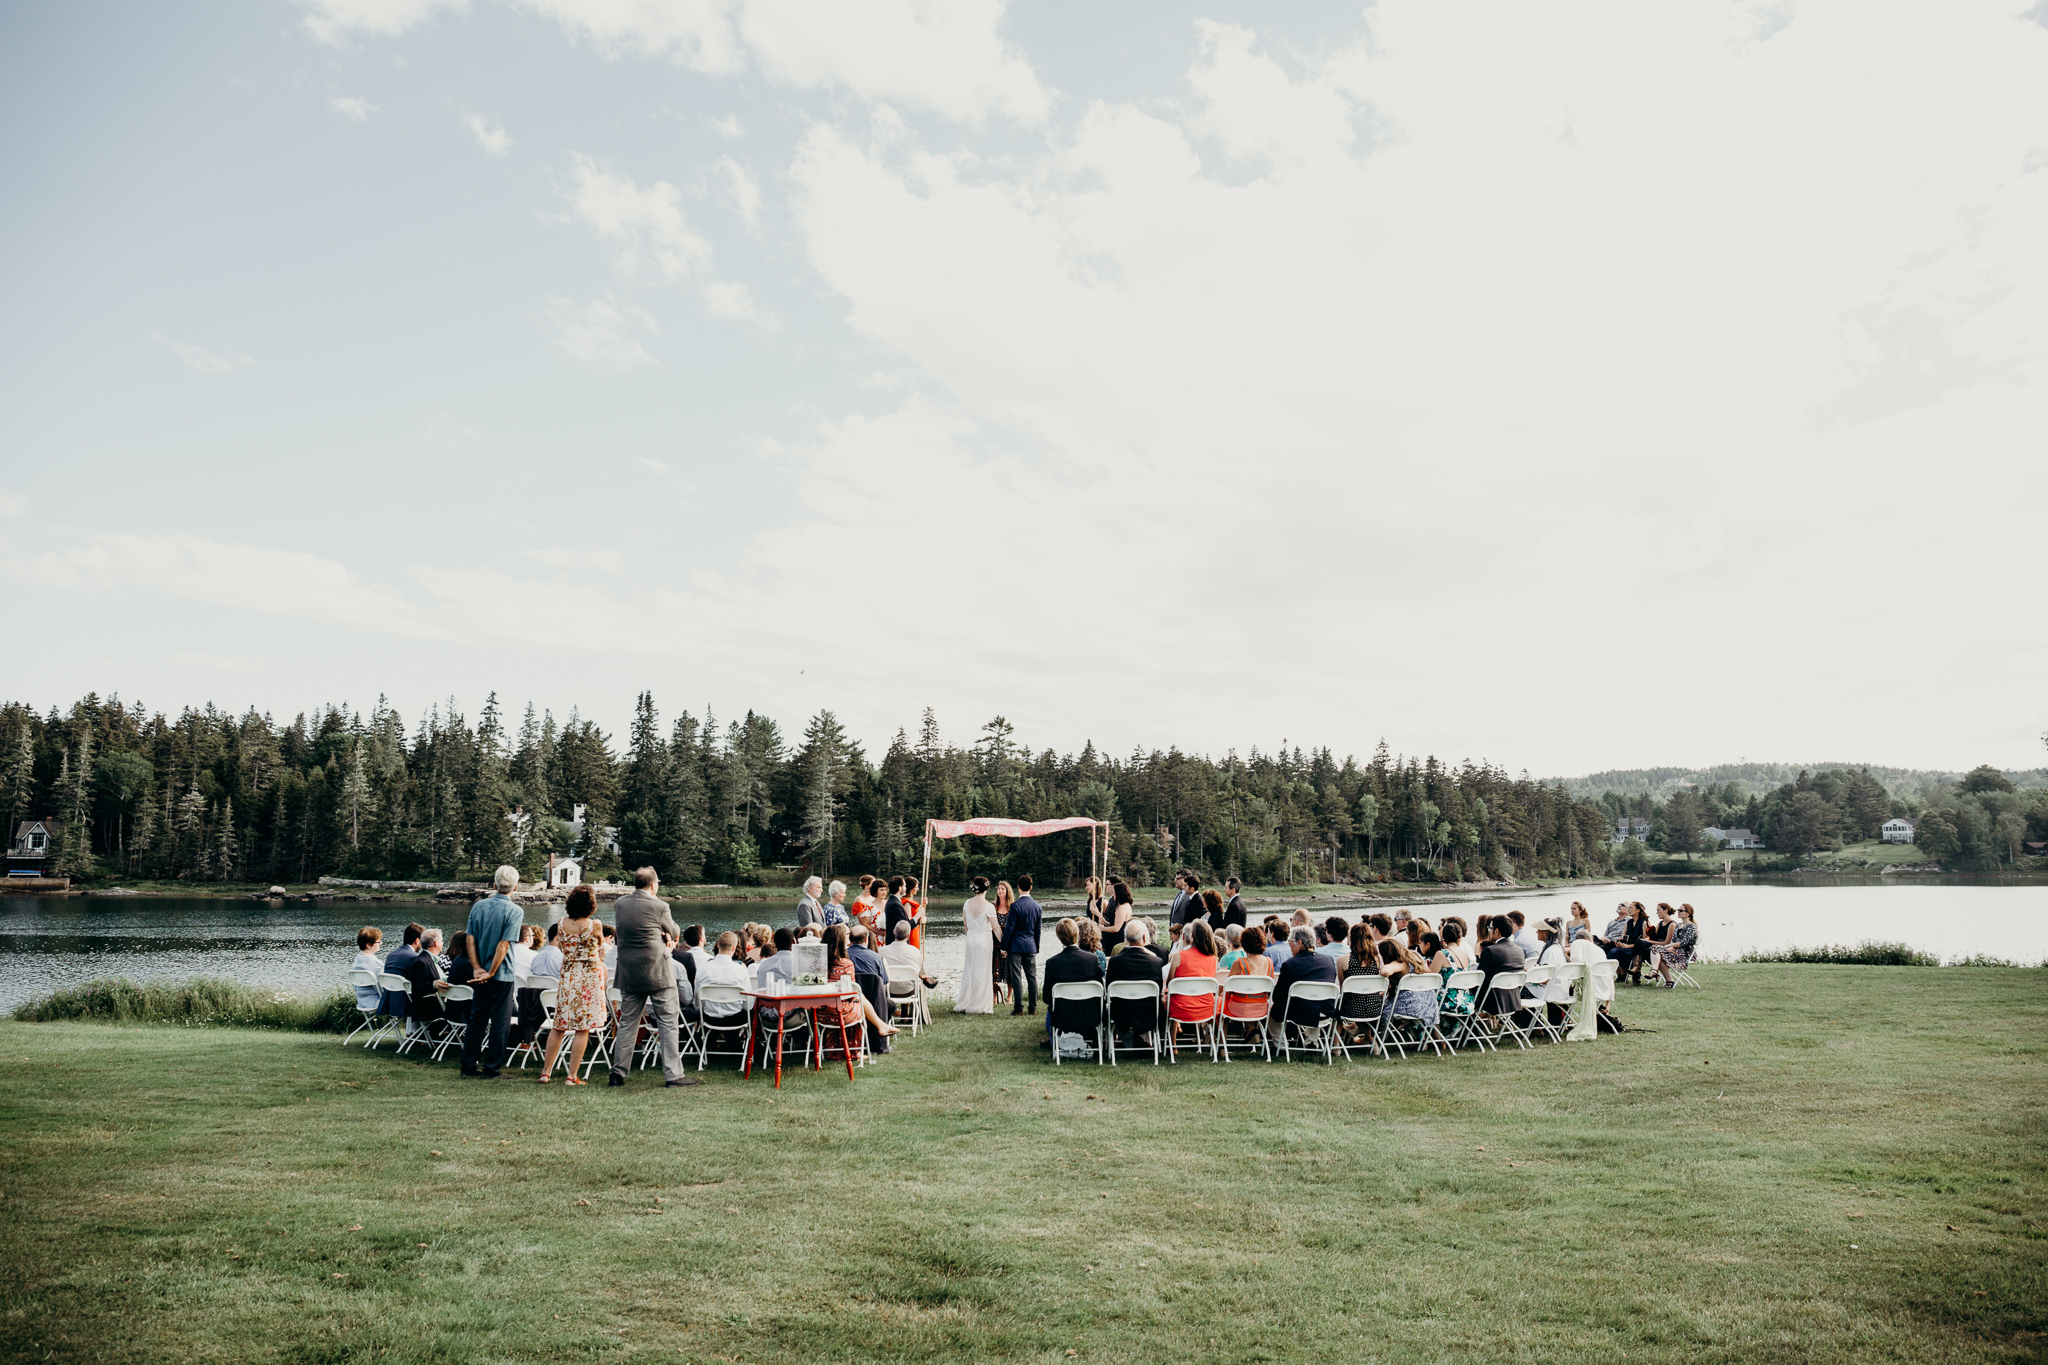 erinwheatco-1259 Maine Wedding by the Sea | Ruth & Ryan